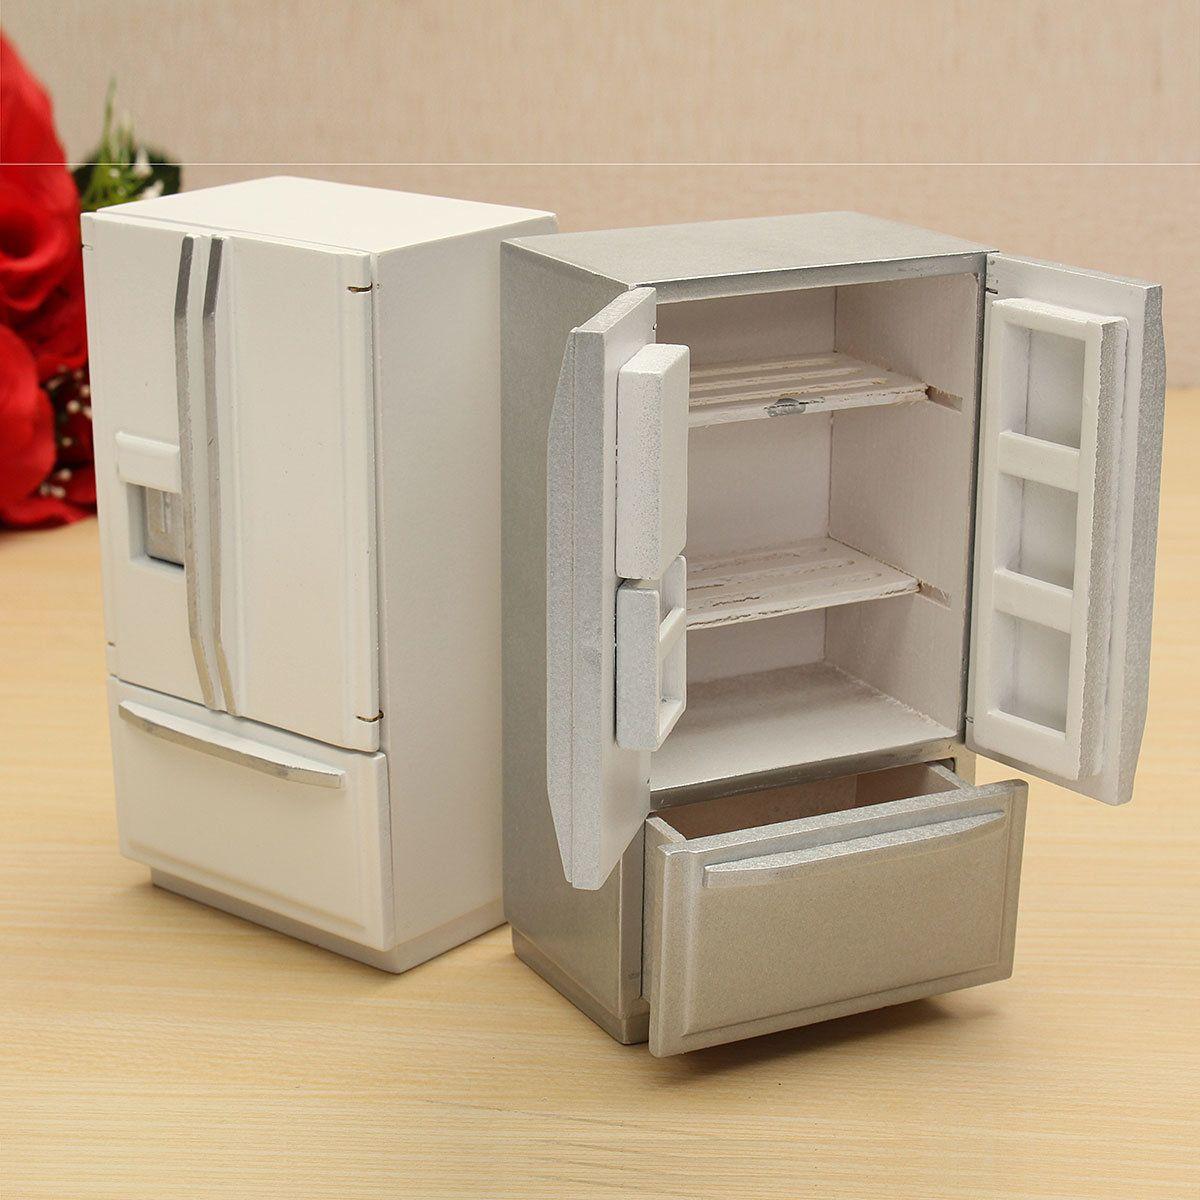 $7.99  1:12 Wooden Dollhouse Miniature Furniture Kitchen Fridge Refrigerator Sale - Banggood.com #miniaturefurniture